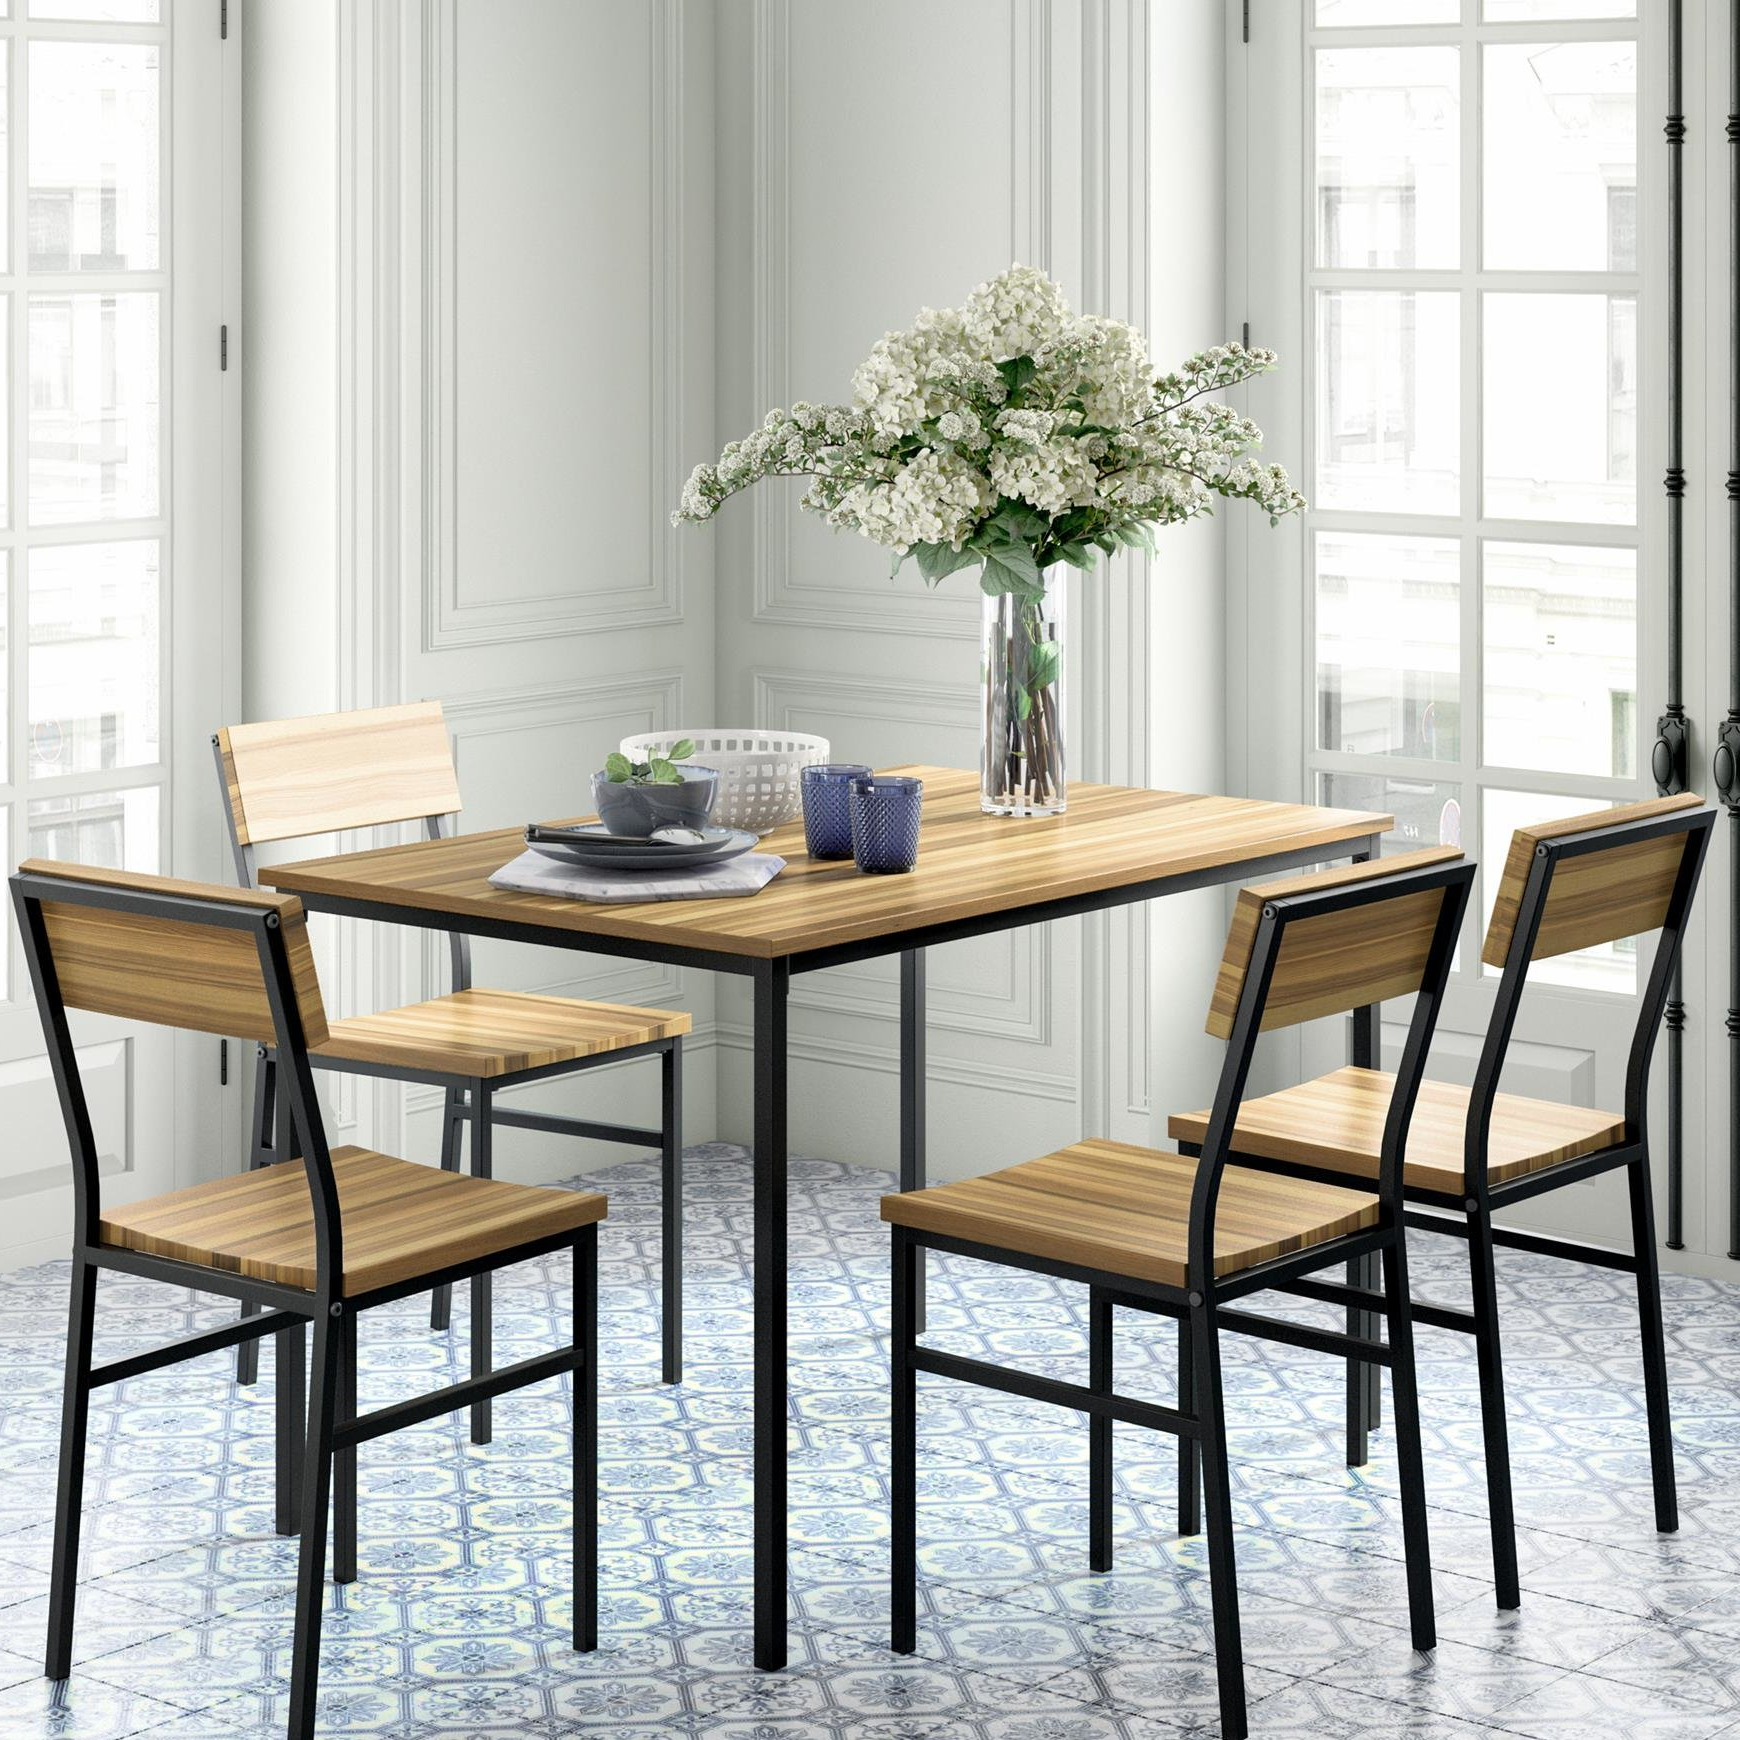 Casiano 5 Piece Dining Sets With Newest Novogratz Linden 5 Piece Dining Set (View 8 of 20)